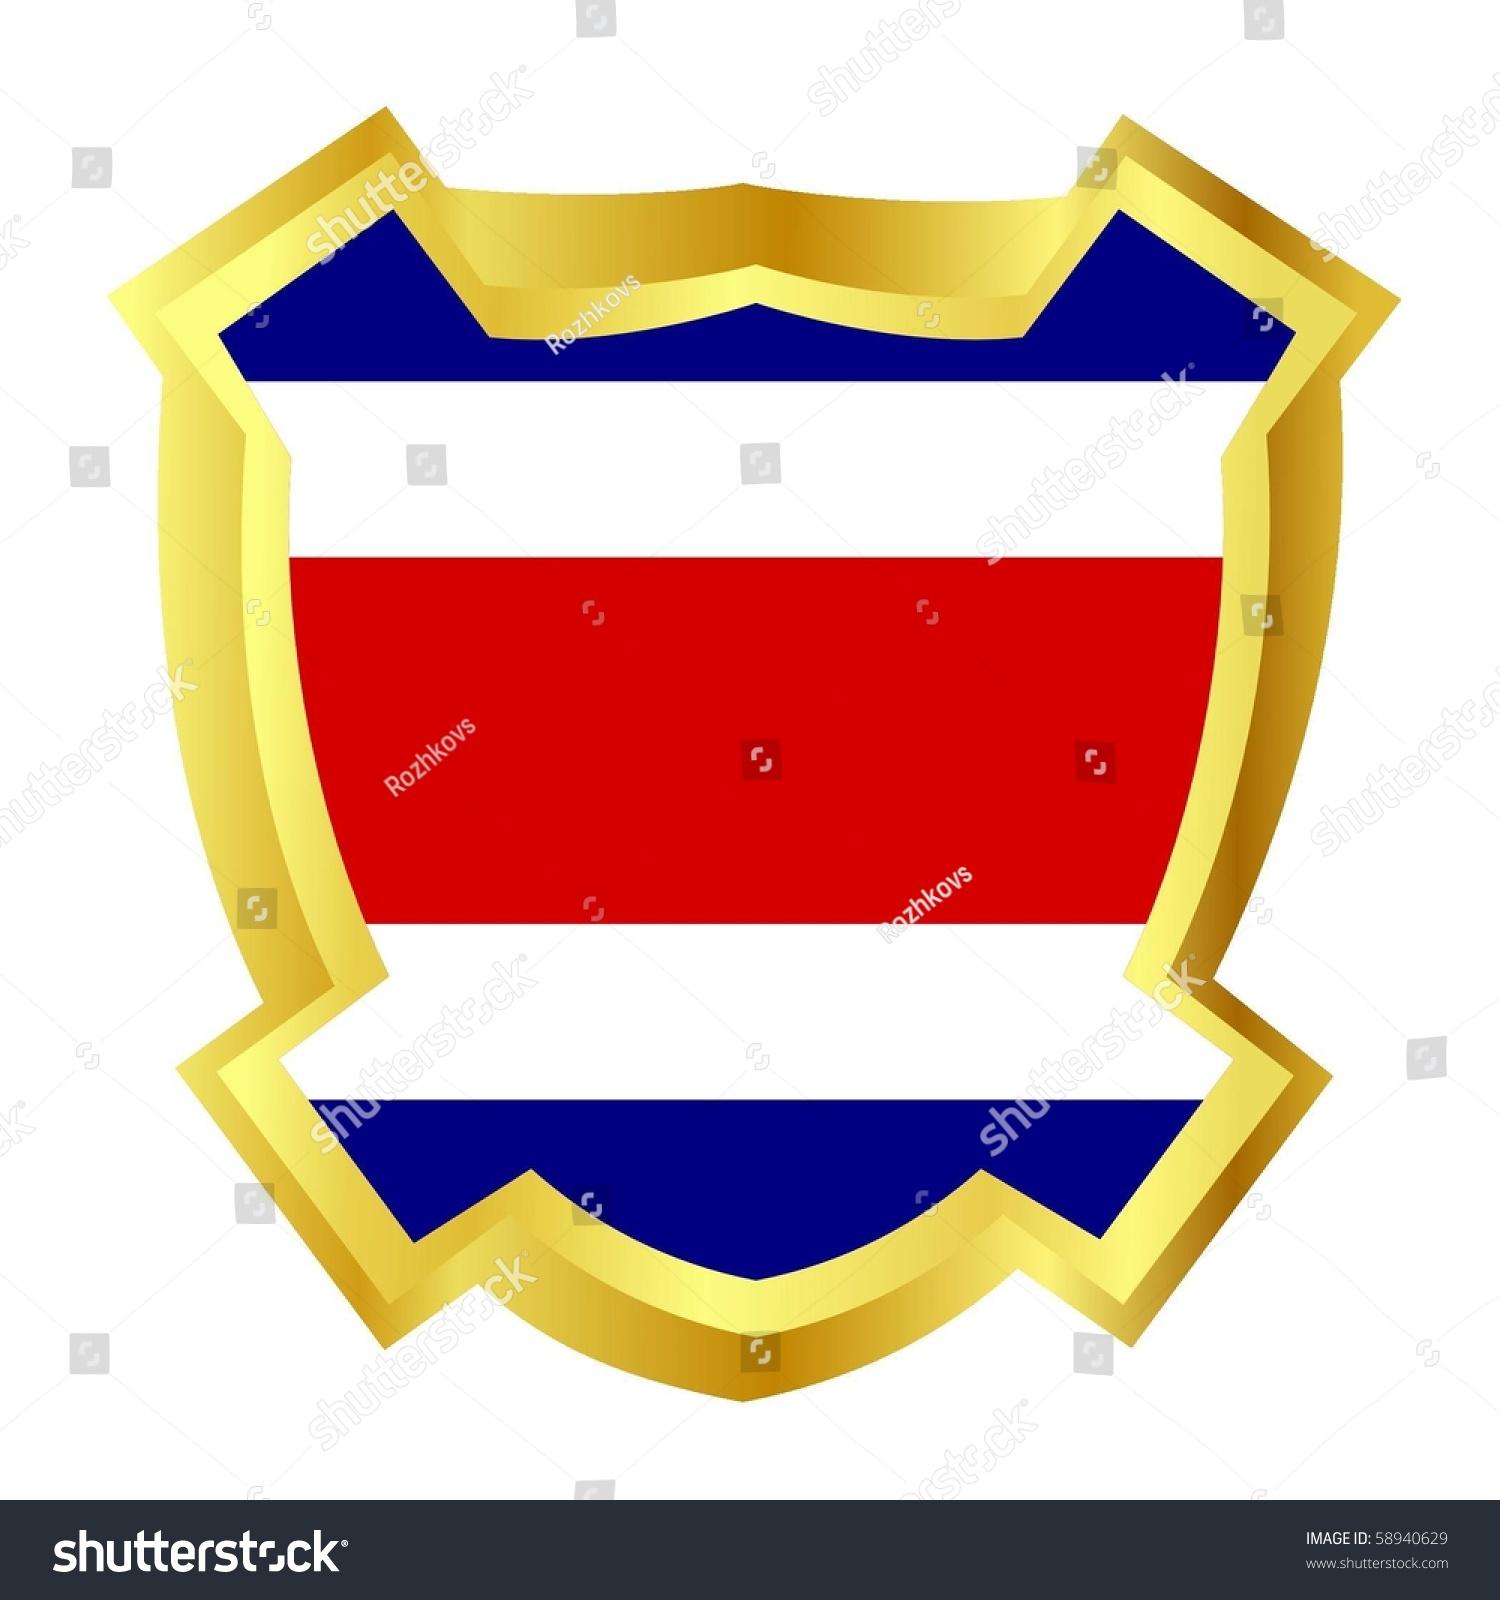 Vector gold shield national symbols costa stock vector 58940629 vector gold shield with the national symbols costa rica biocorpaavc Gallery